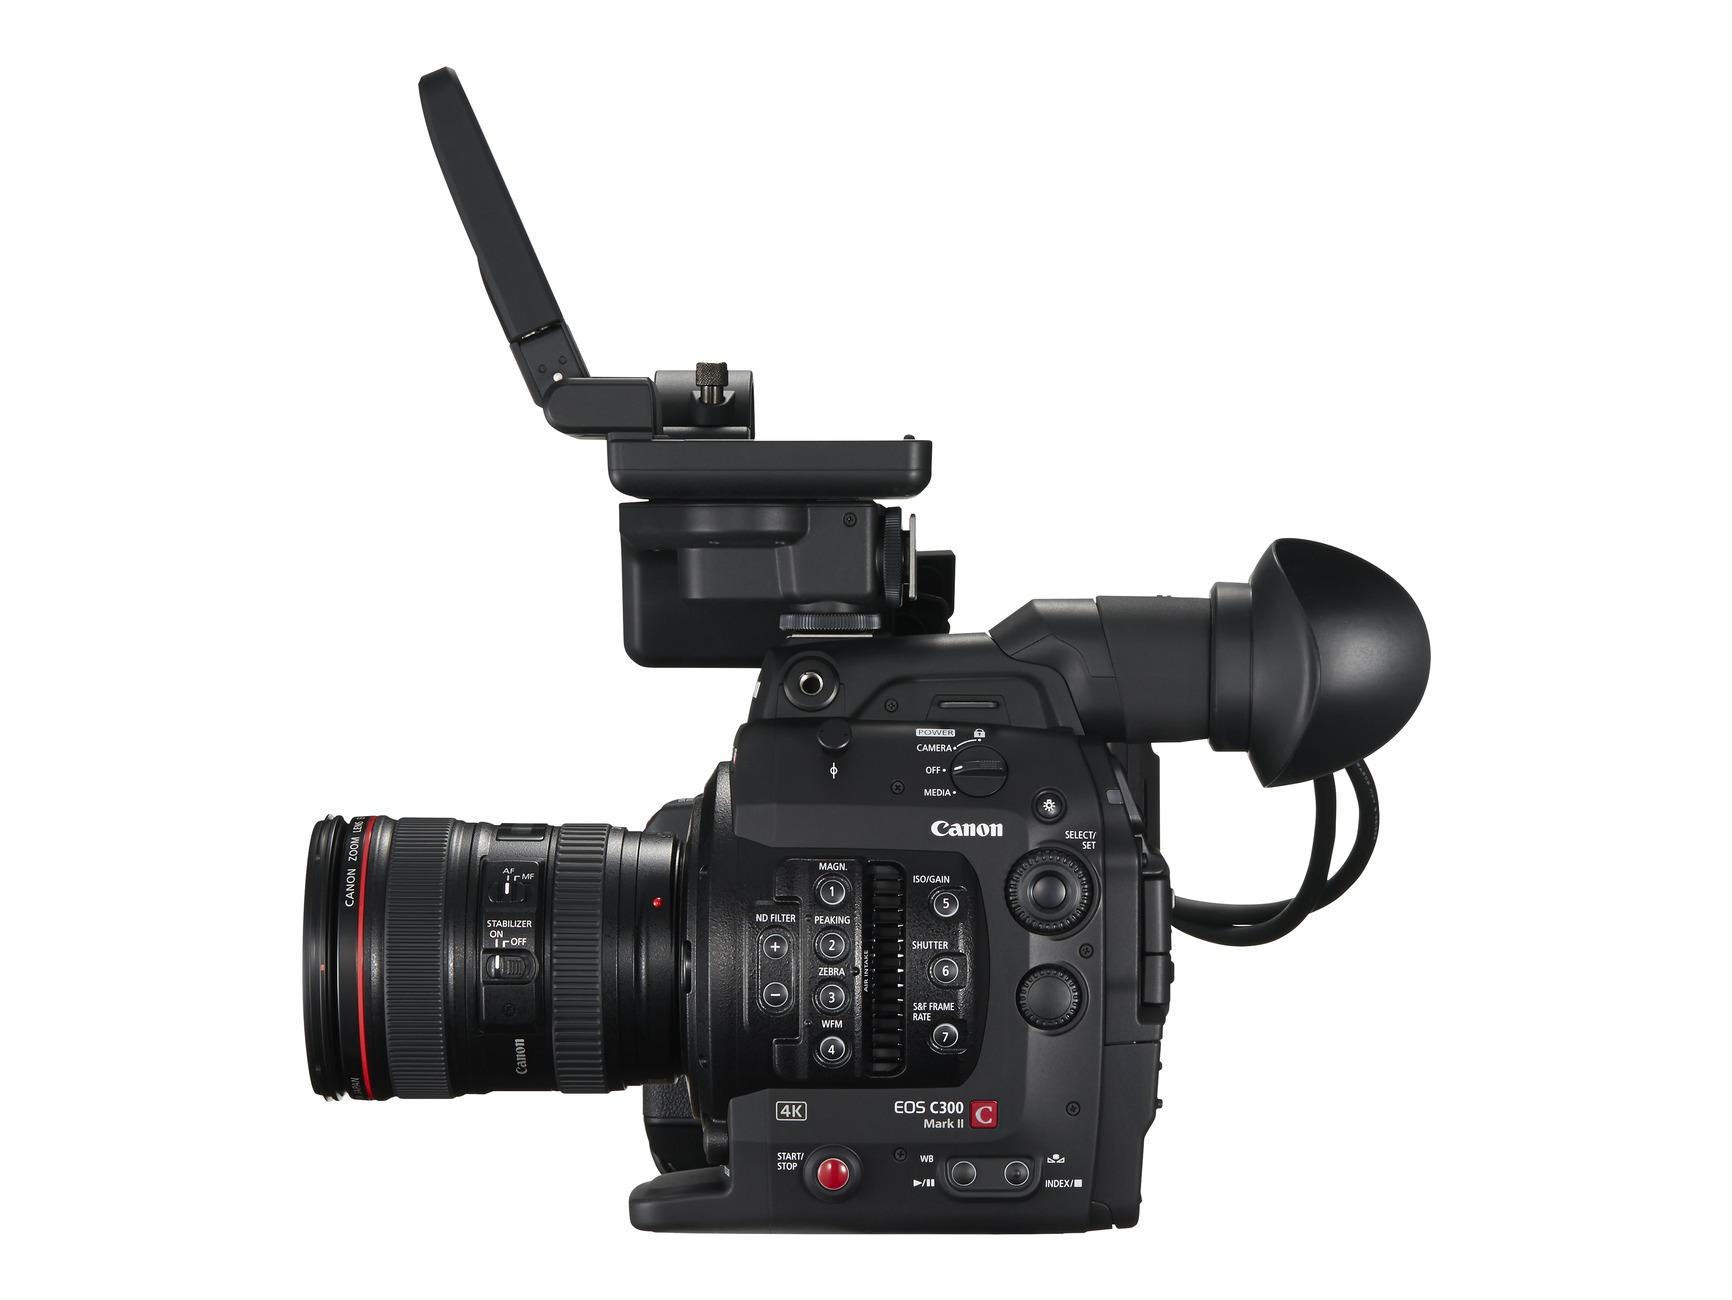 New Canon EOS C300 Mark II $16,000 4K Cinema Camera